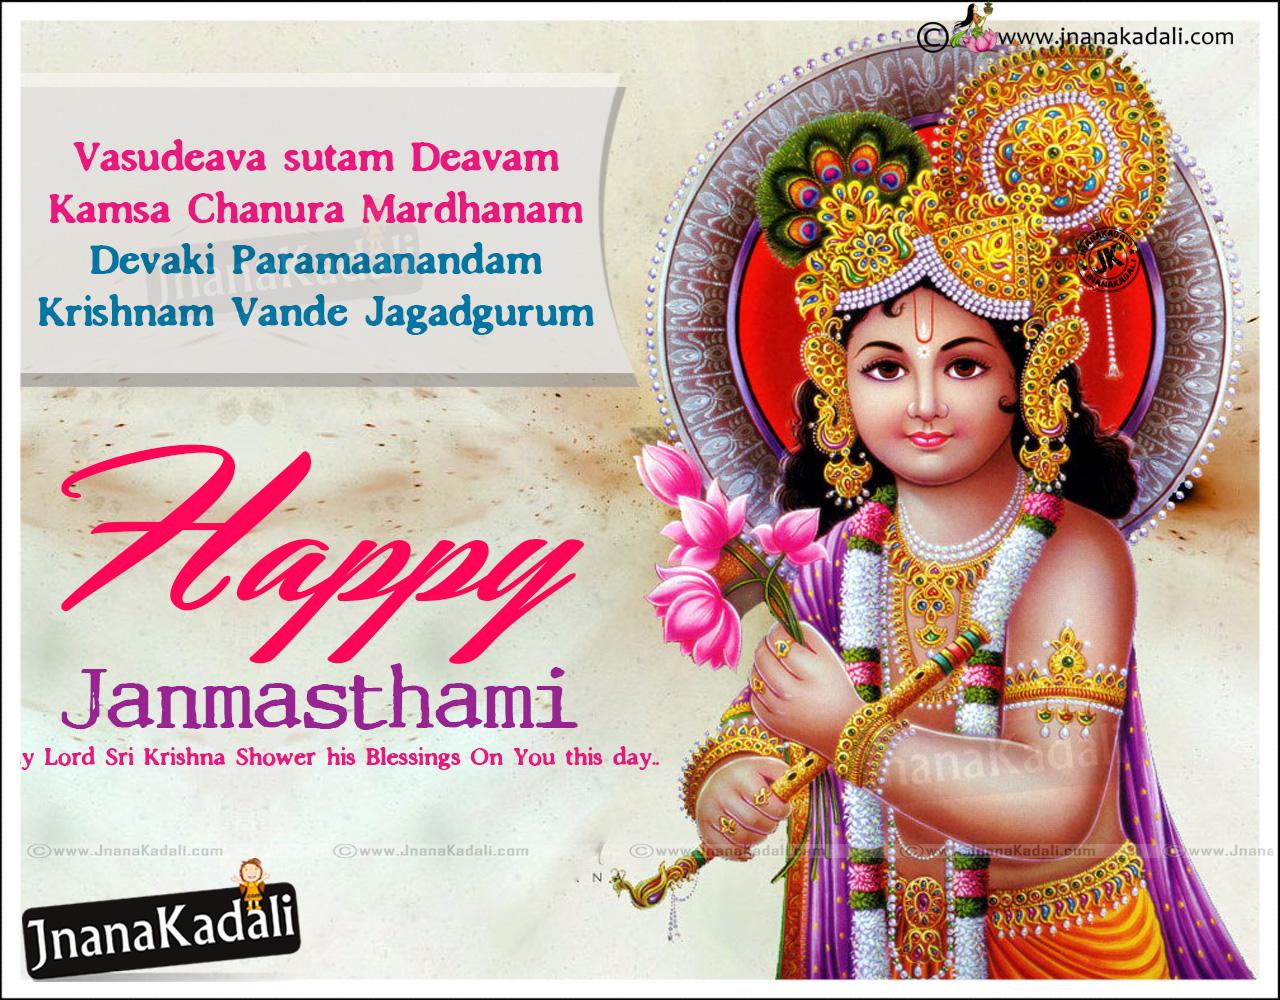 Sri krishna janmashtami 2016 wishes quotes greetings in english here is a sri krishna janmashtami greetings in english krishnaashtami greetings in englishenglish kristyandbryce Gallery